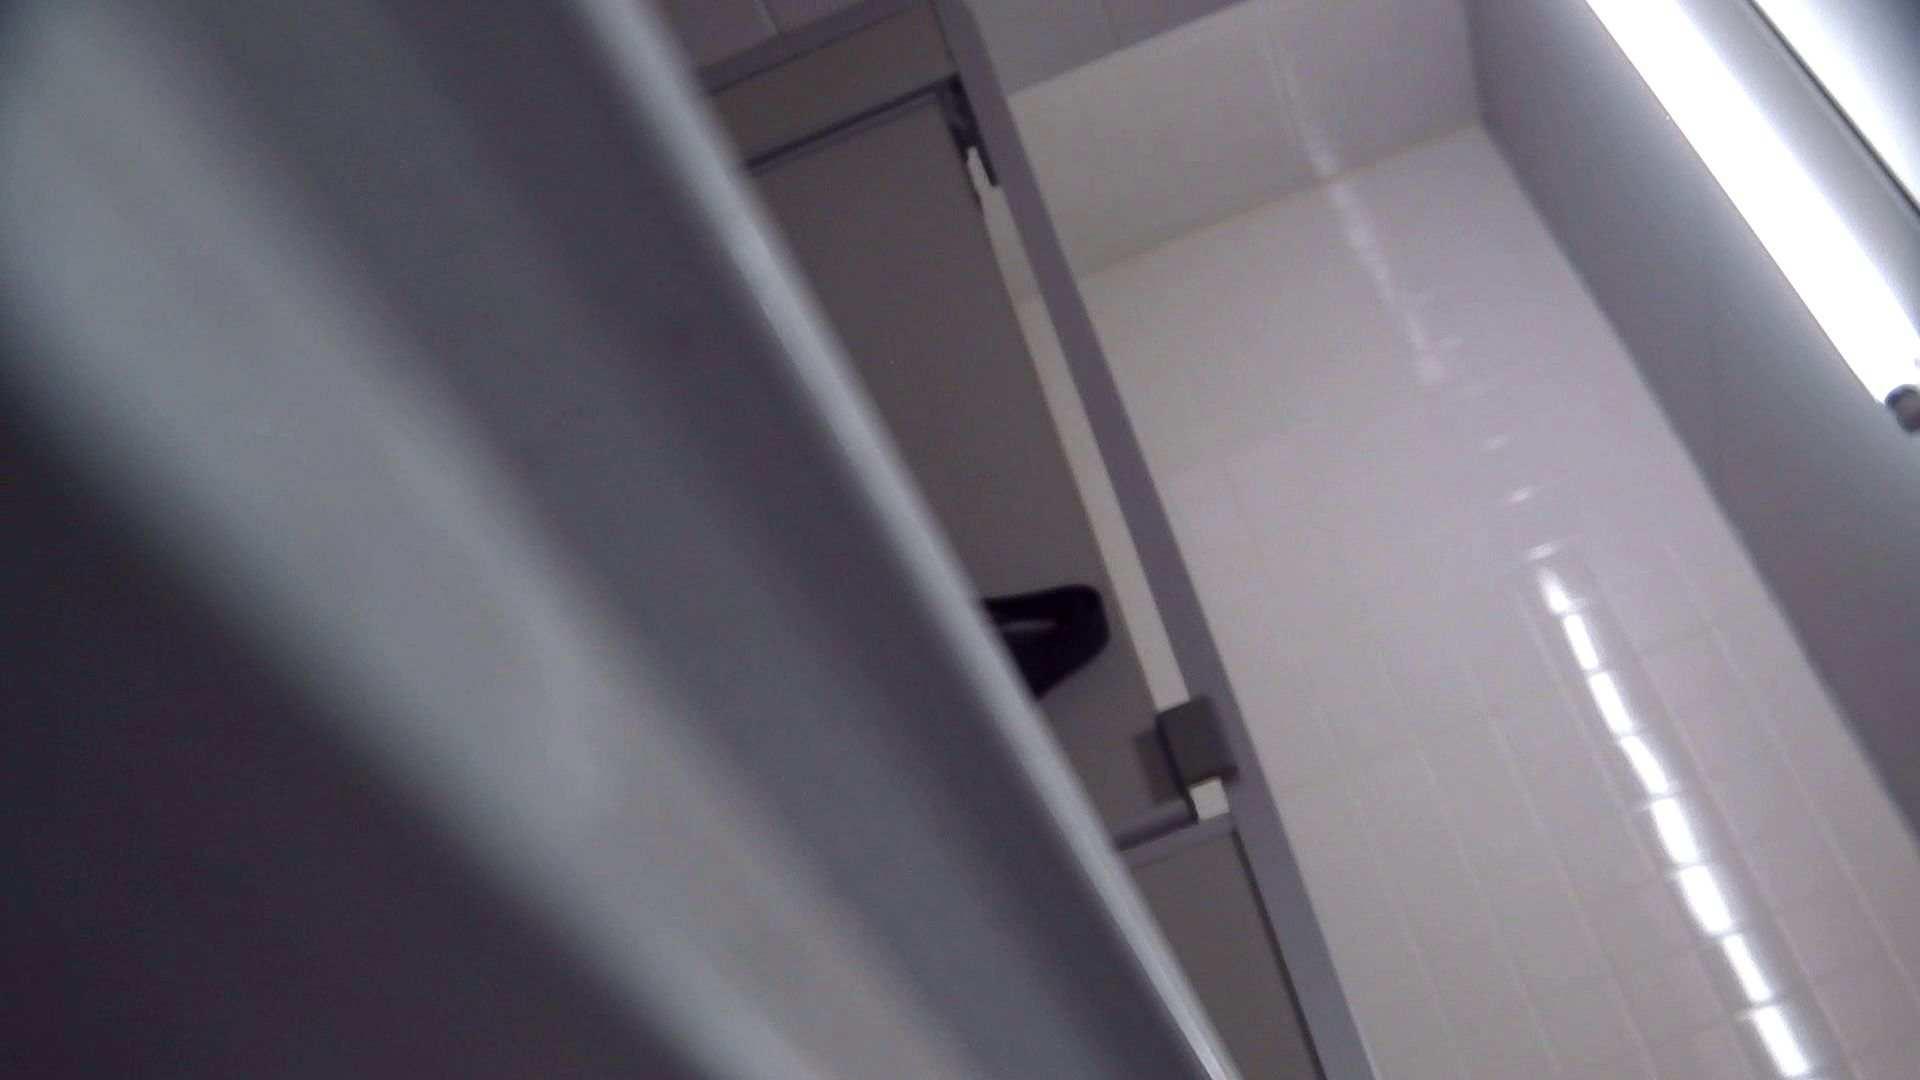 vol.04 命がけ潜伏洗面所! オシリのお肌が荒れ気味ですか? プライベート アダルト動画キャプチャ 72画像 51